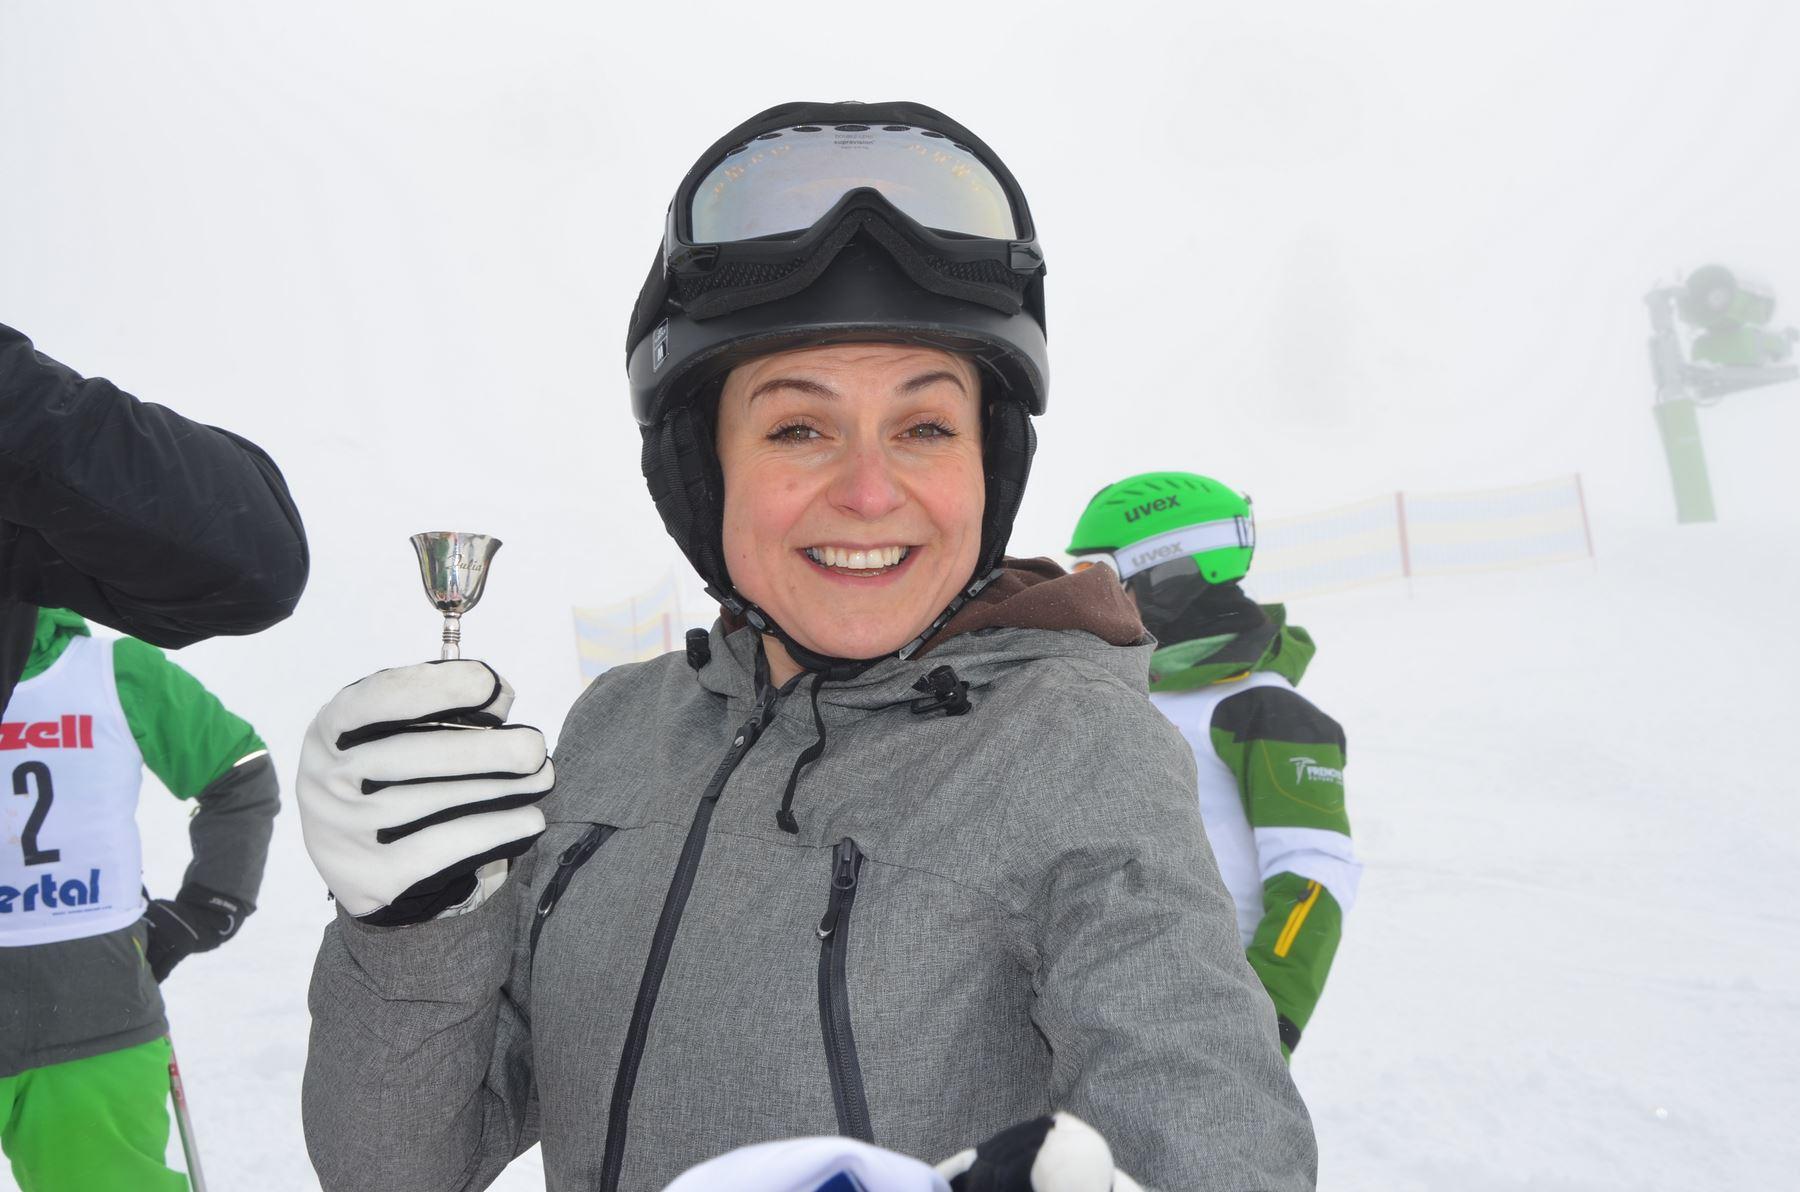 2015-03-22 BV Zillertal Skirennen 013.JPG